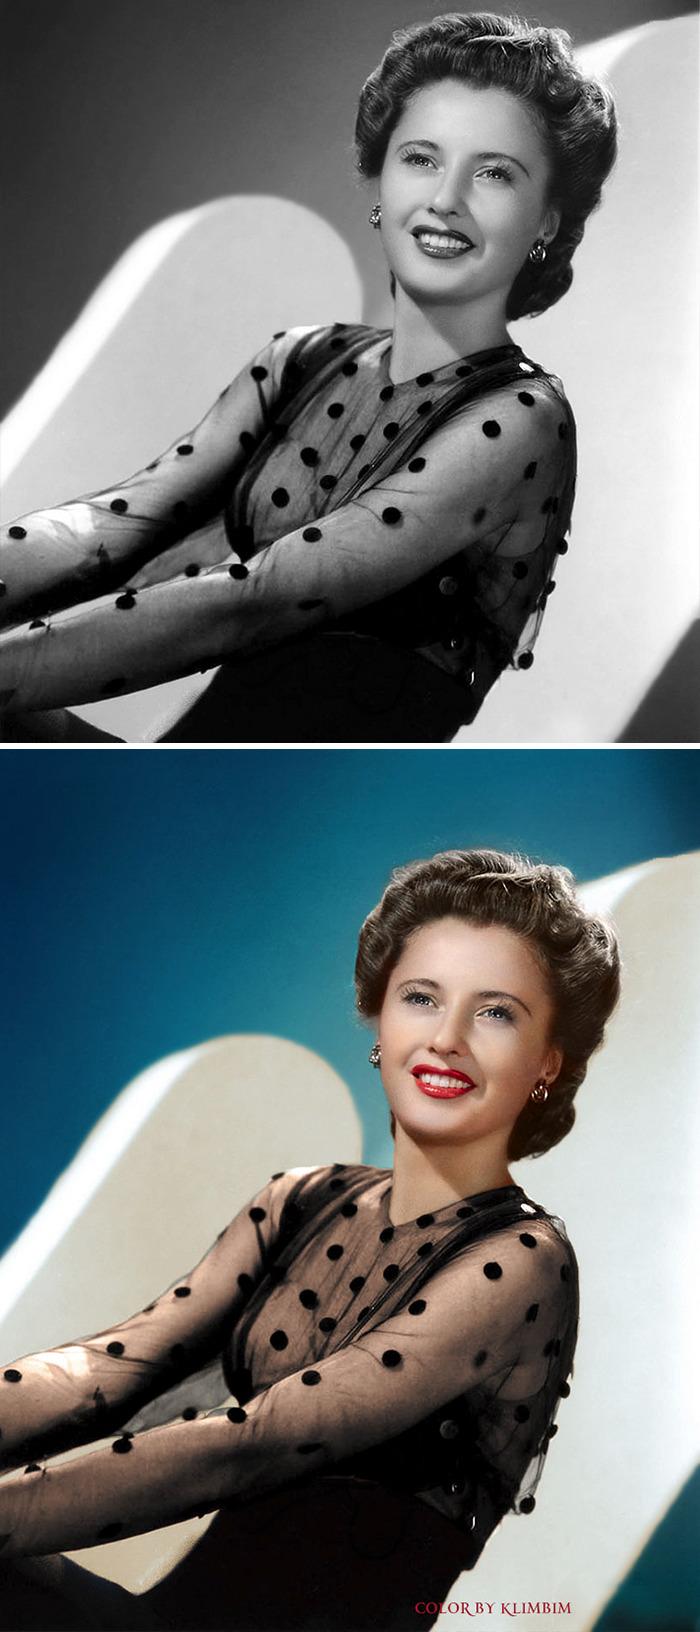 5e69f0c243744 This Russian artist impresses by giving vivid colors to photos of celebrities from the past 5e679b2f0d88a png  700 - Fotos antigas coloridas de estrelas clássicas de Hollywood